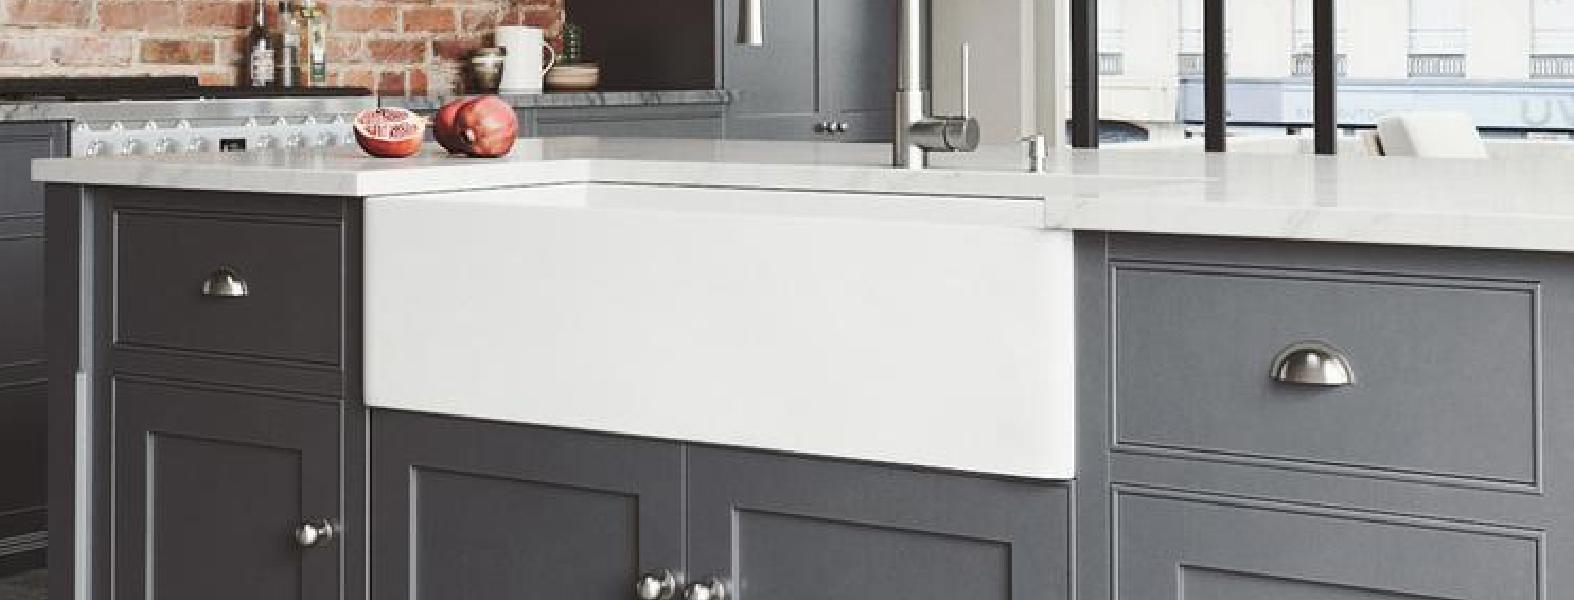 kitchen skins kitchen sinks at home depot